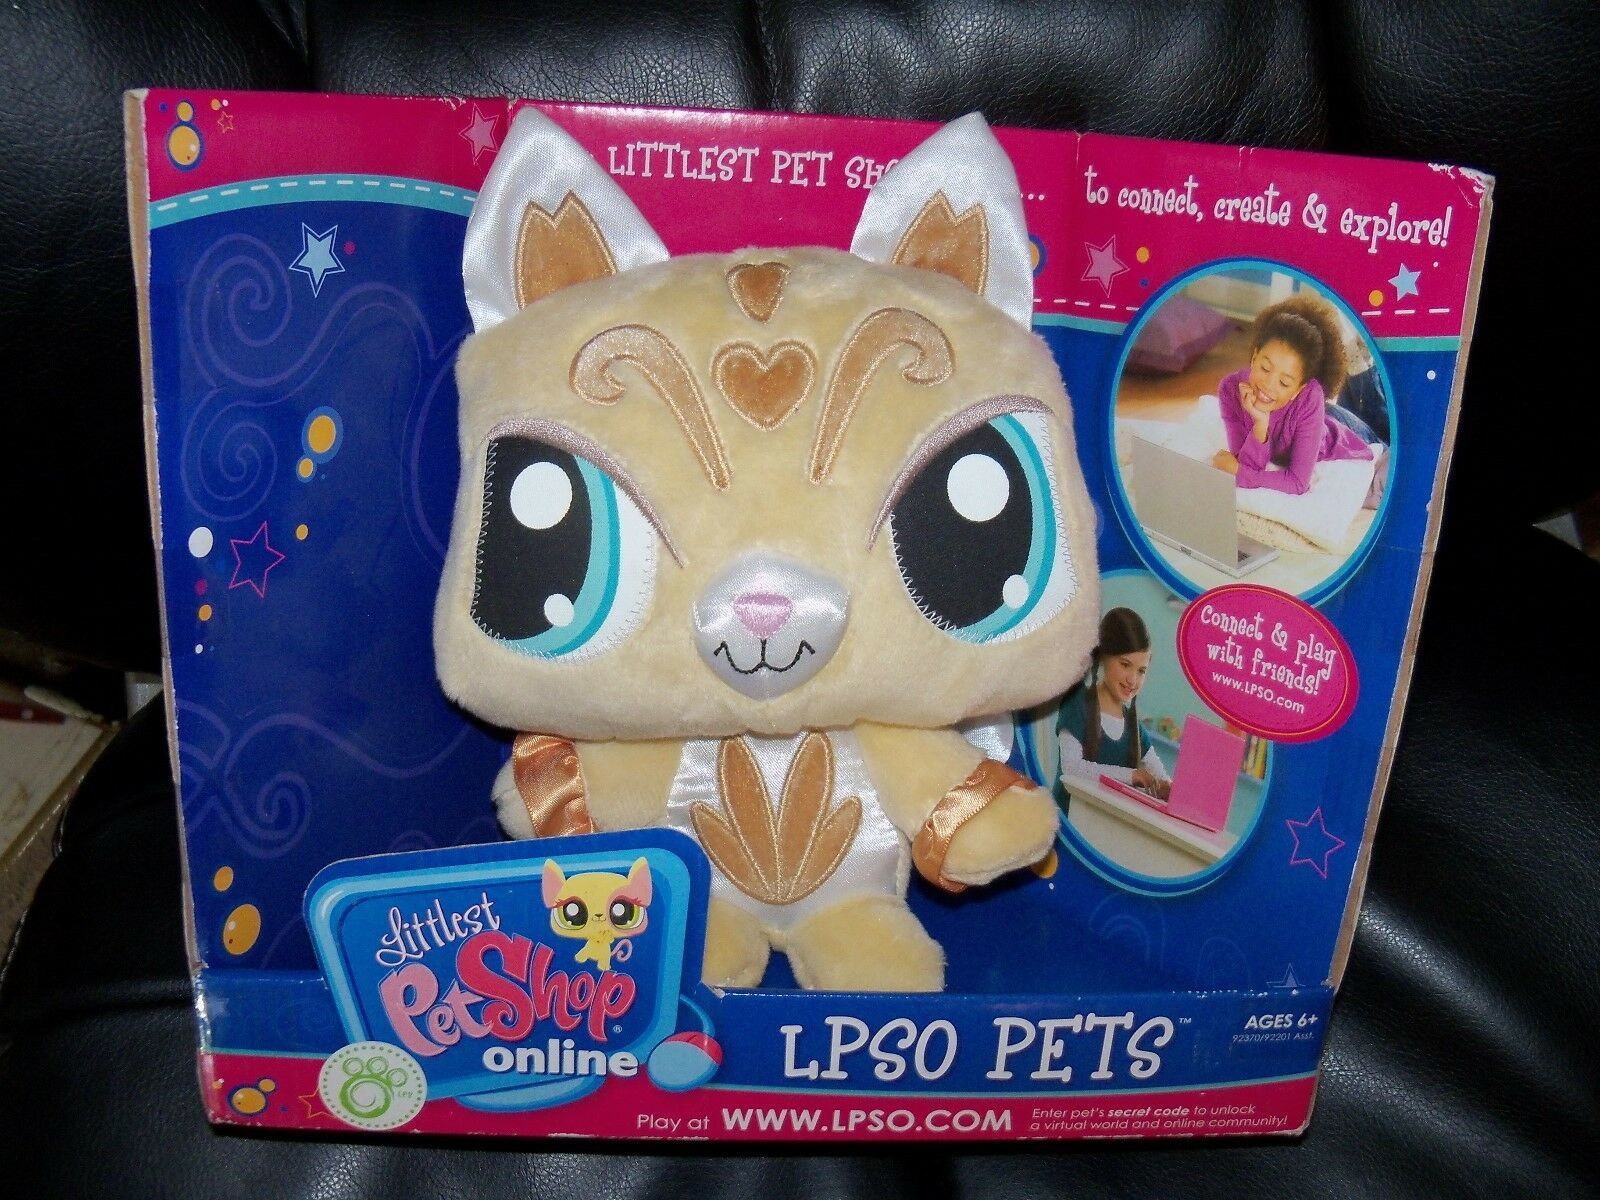 Littlest Pet Shop Lpso Virtual Online Online Online Pets golden Kitty NEW dd7262